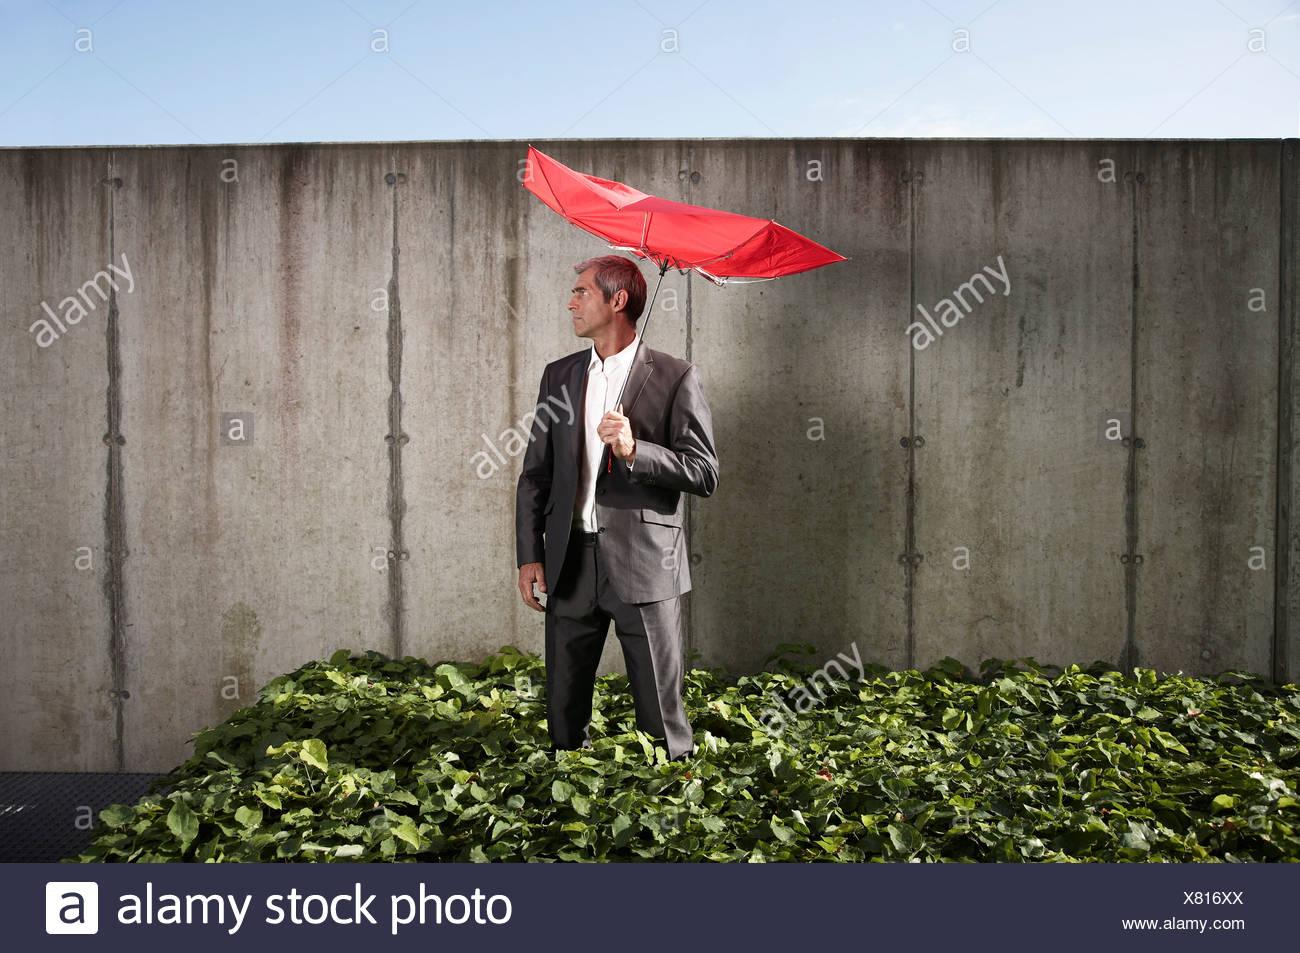 Geschäftsmann mit beschädigten roten Regenschirm Stockbild